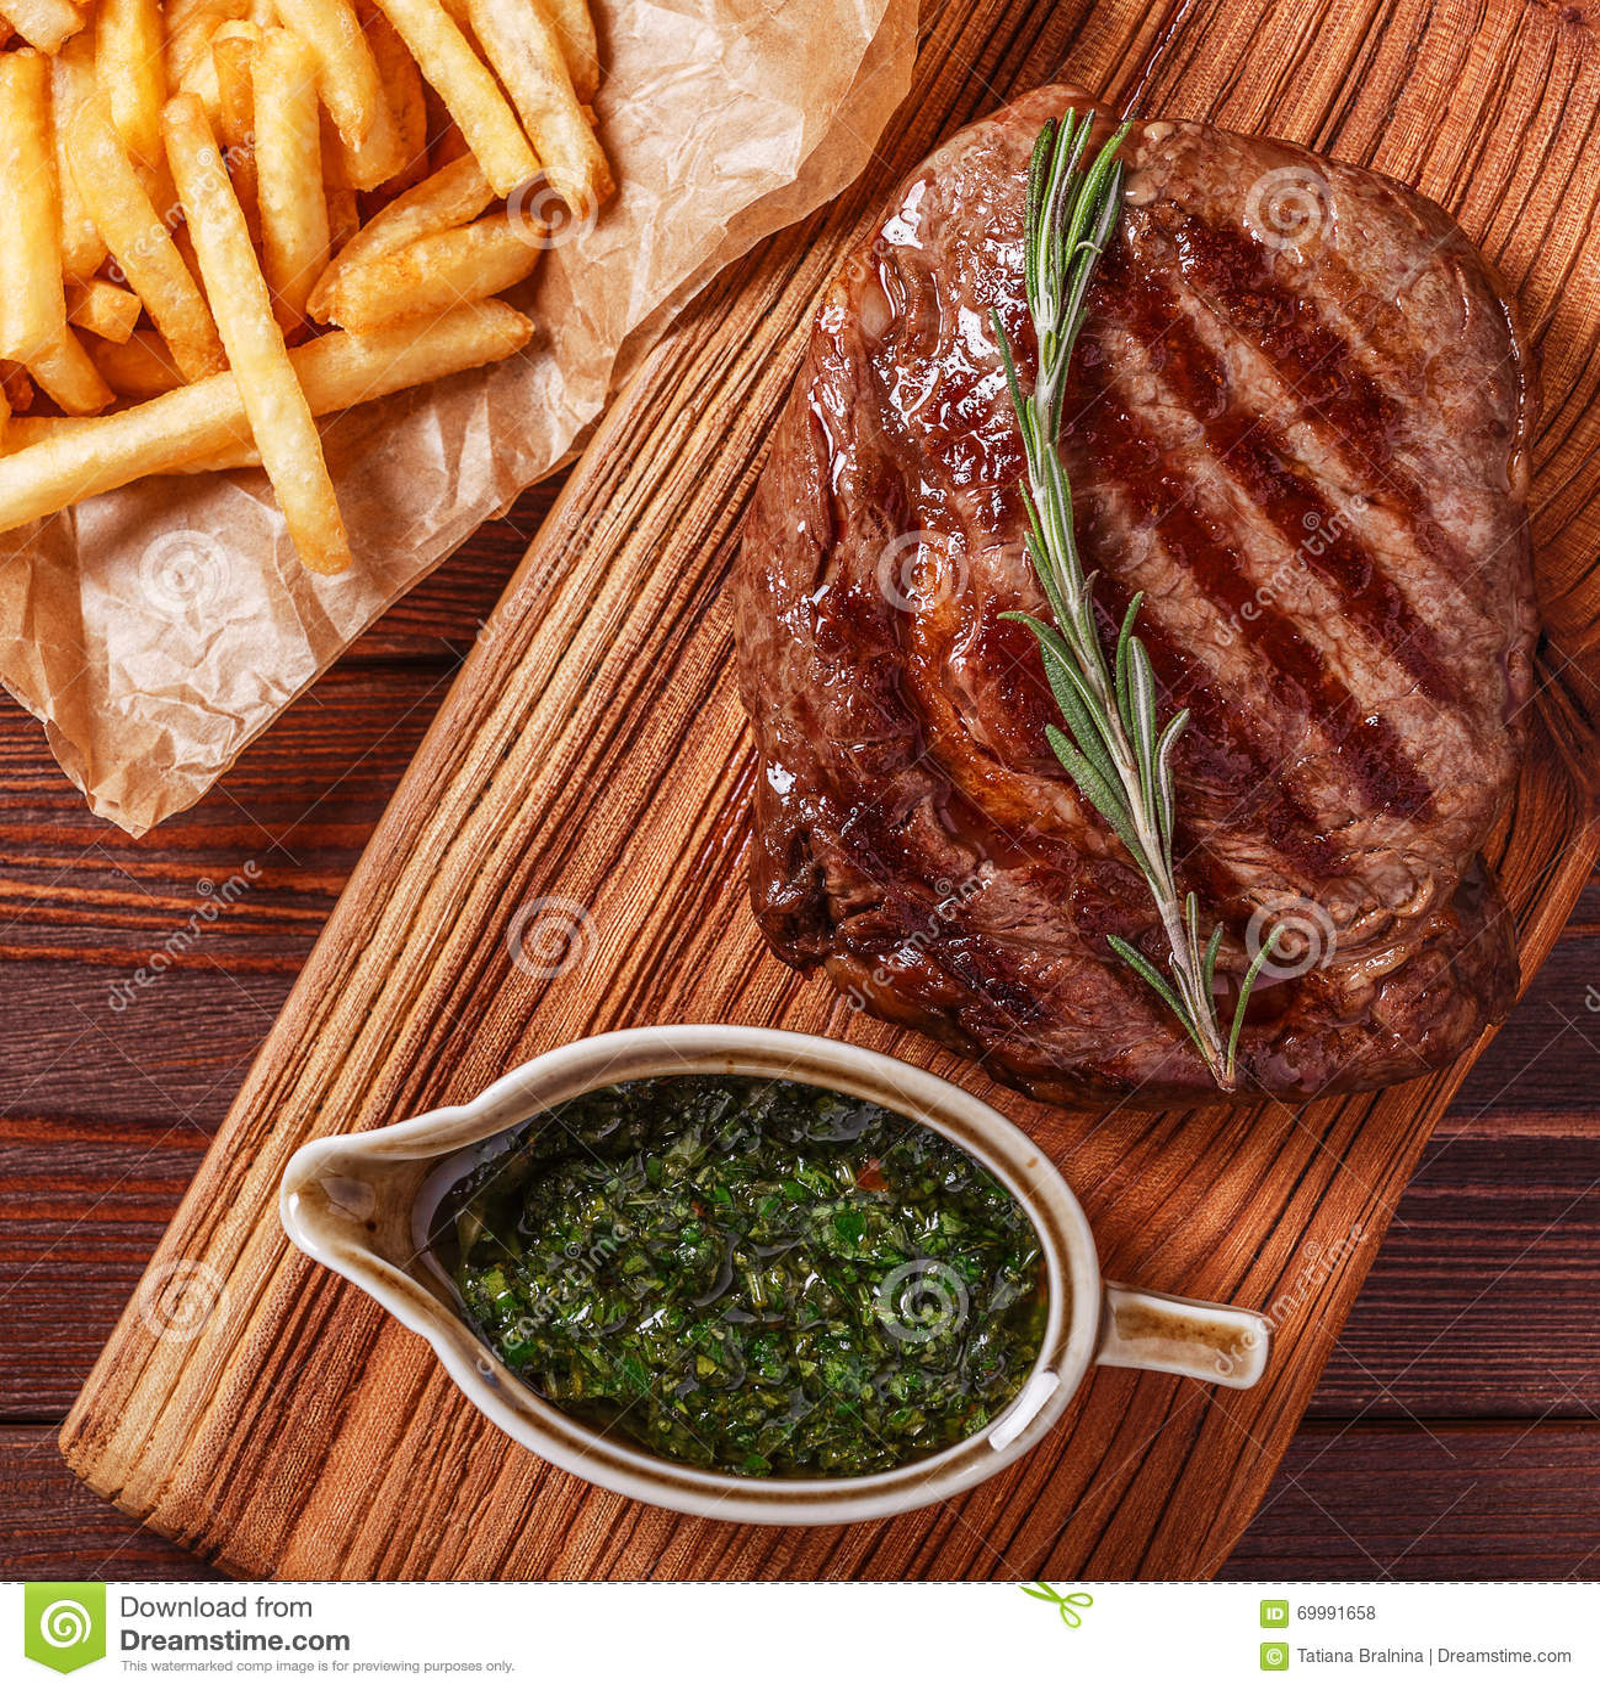 Beef barbecue ribeye steak with chimichurri sauce and french fri